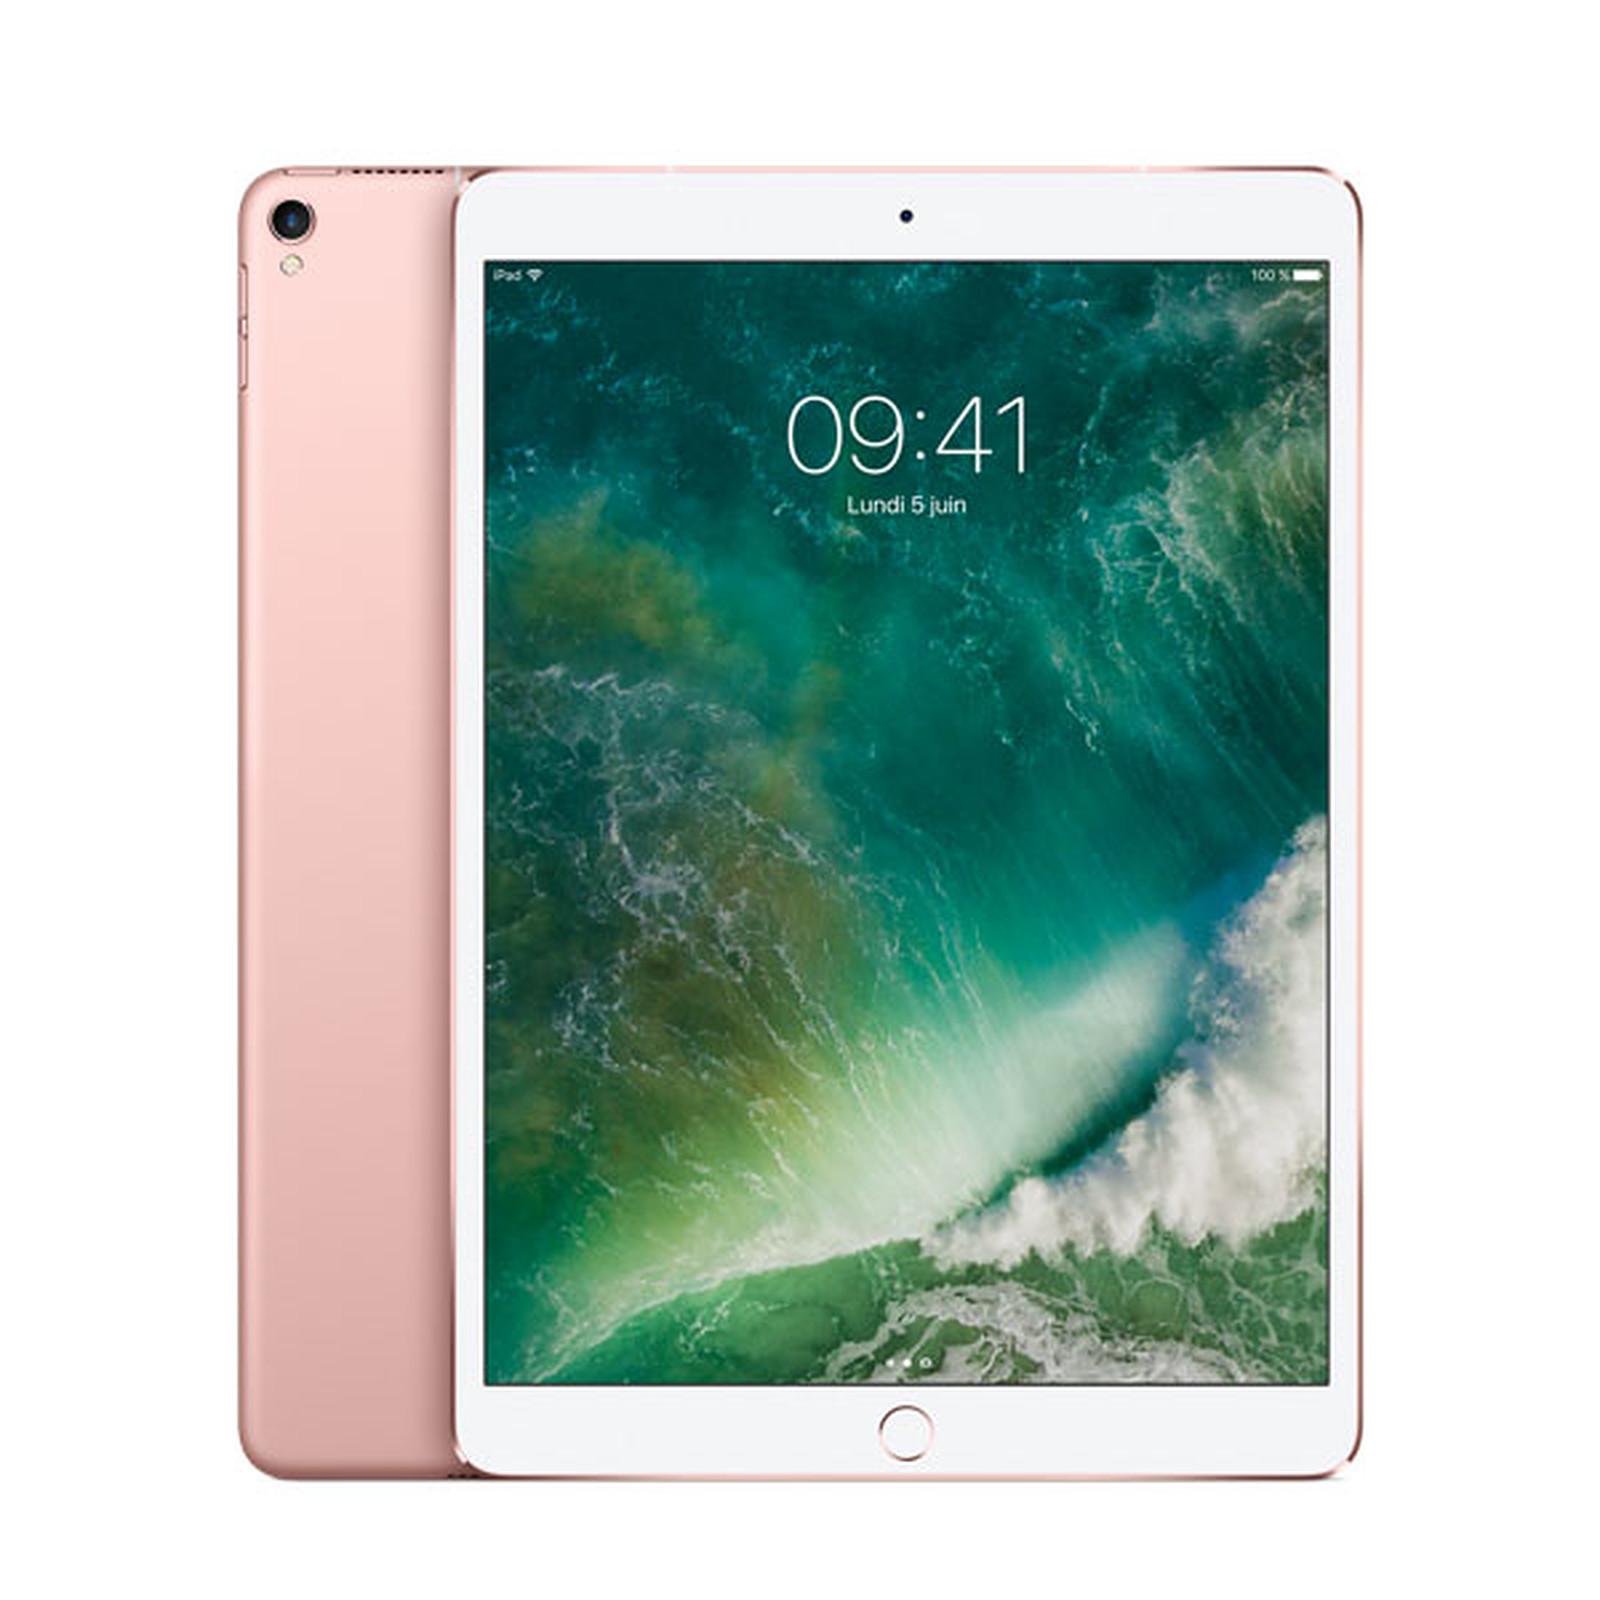 Apple iPad Pro 10.5 pulgadas 256GB Wi-Fi Oro Rosa